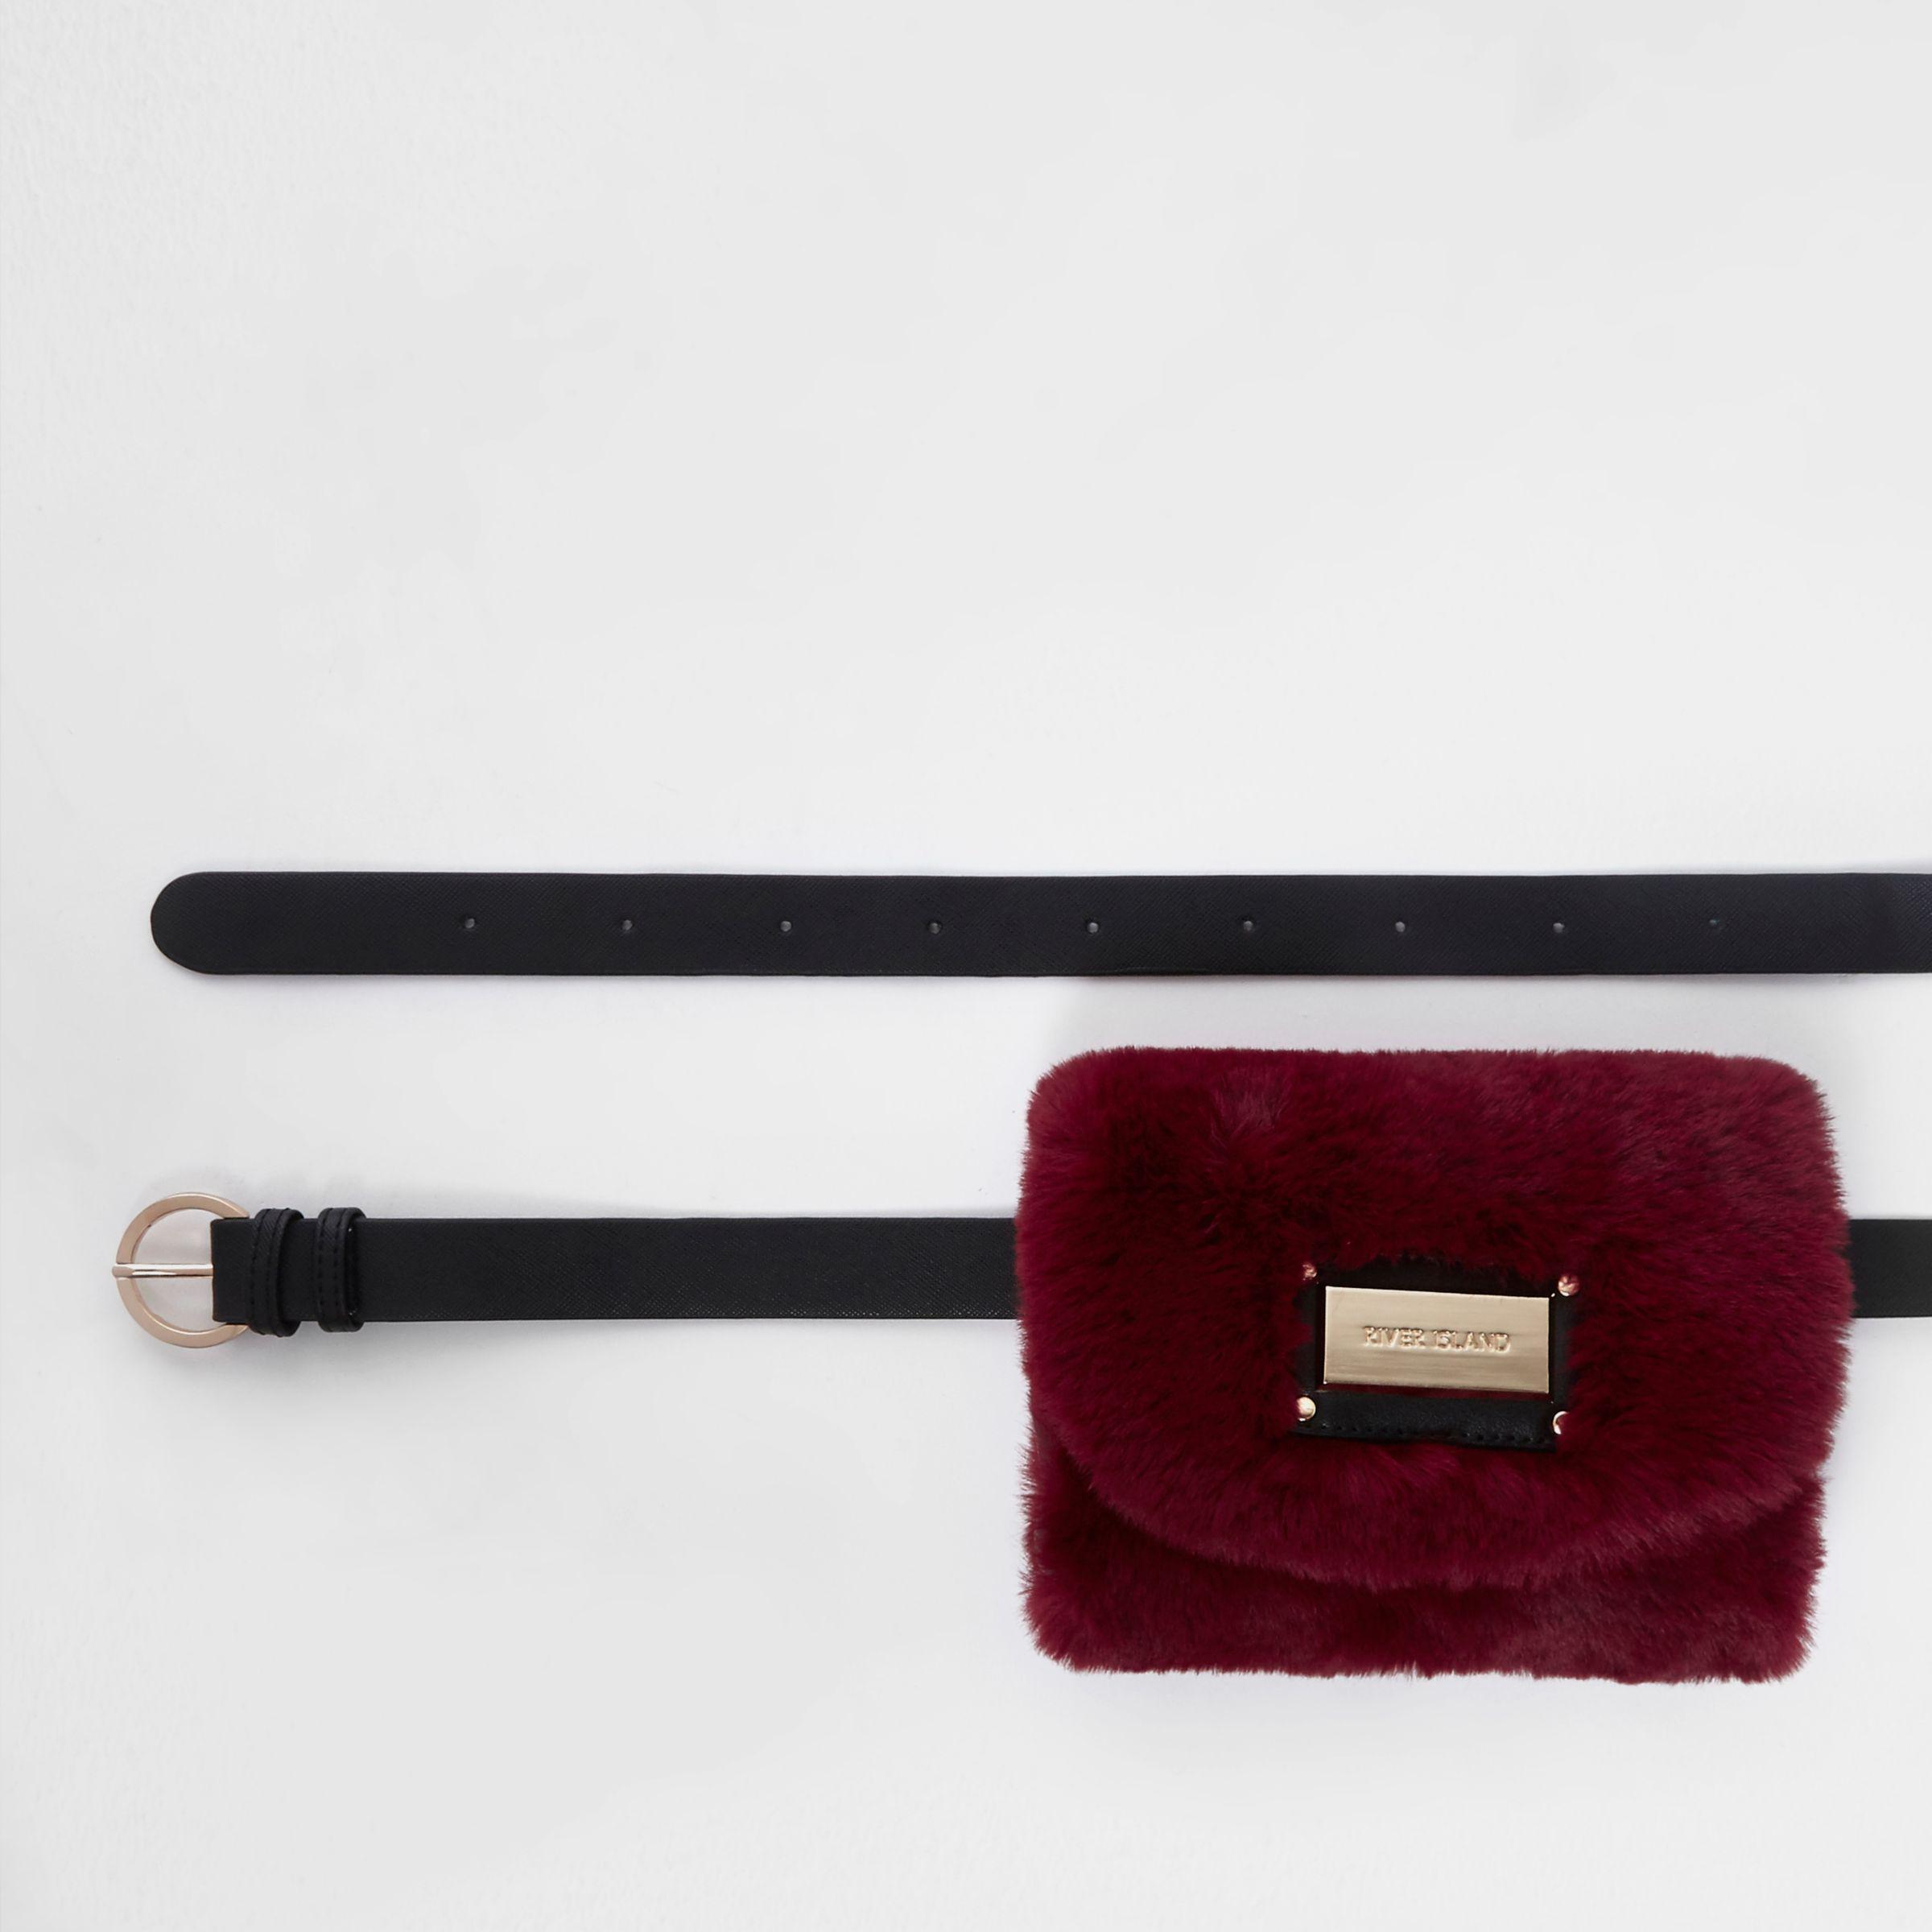 1b1713ea79 River Island Dark Red Faux Fur Buckle Belt Bum Bag in Red - Lyst